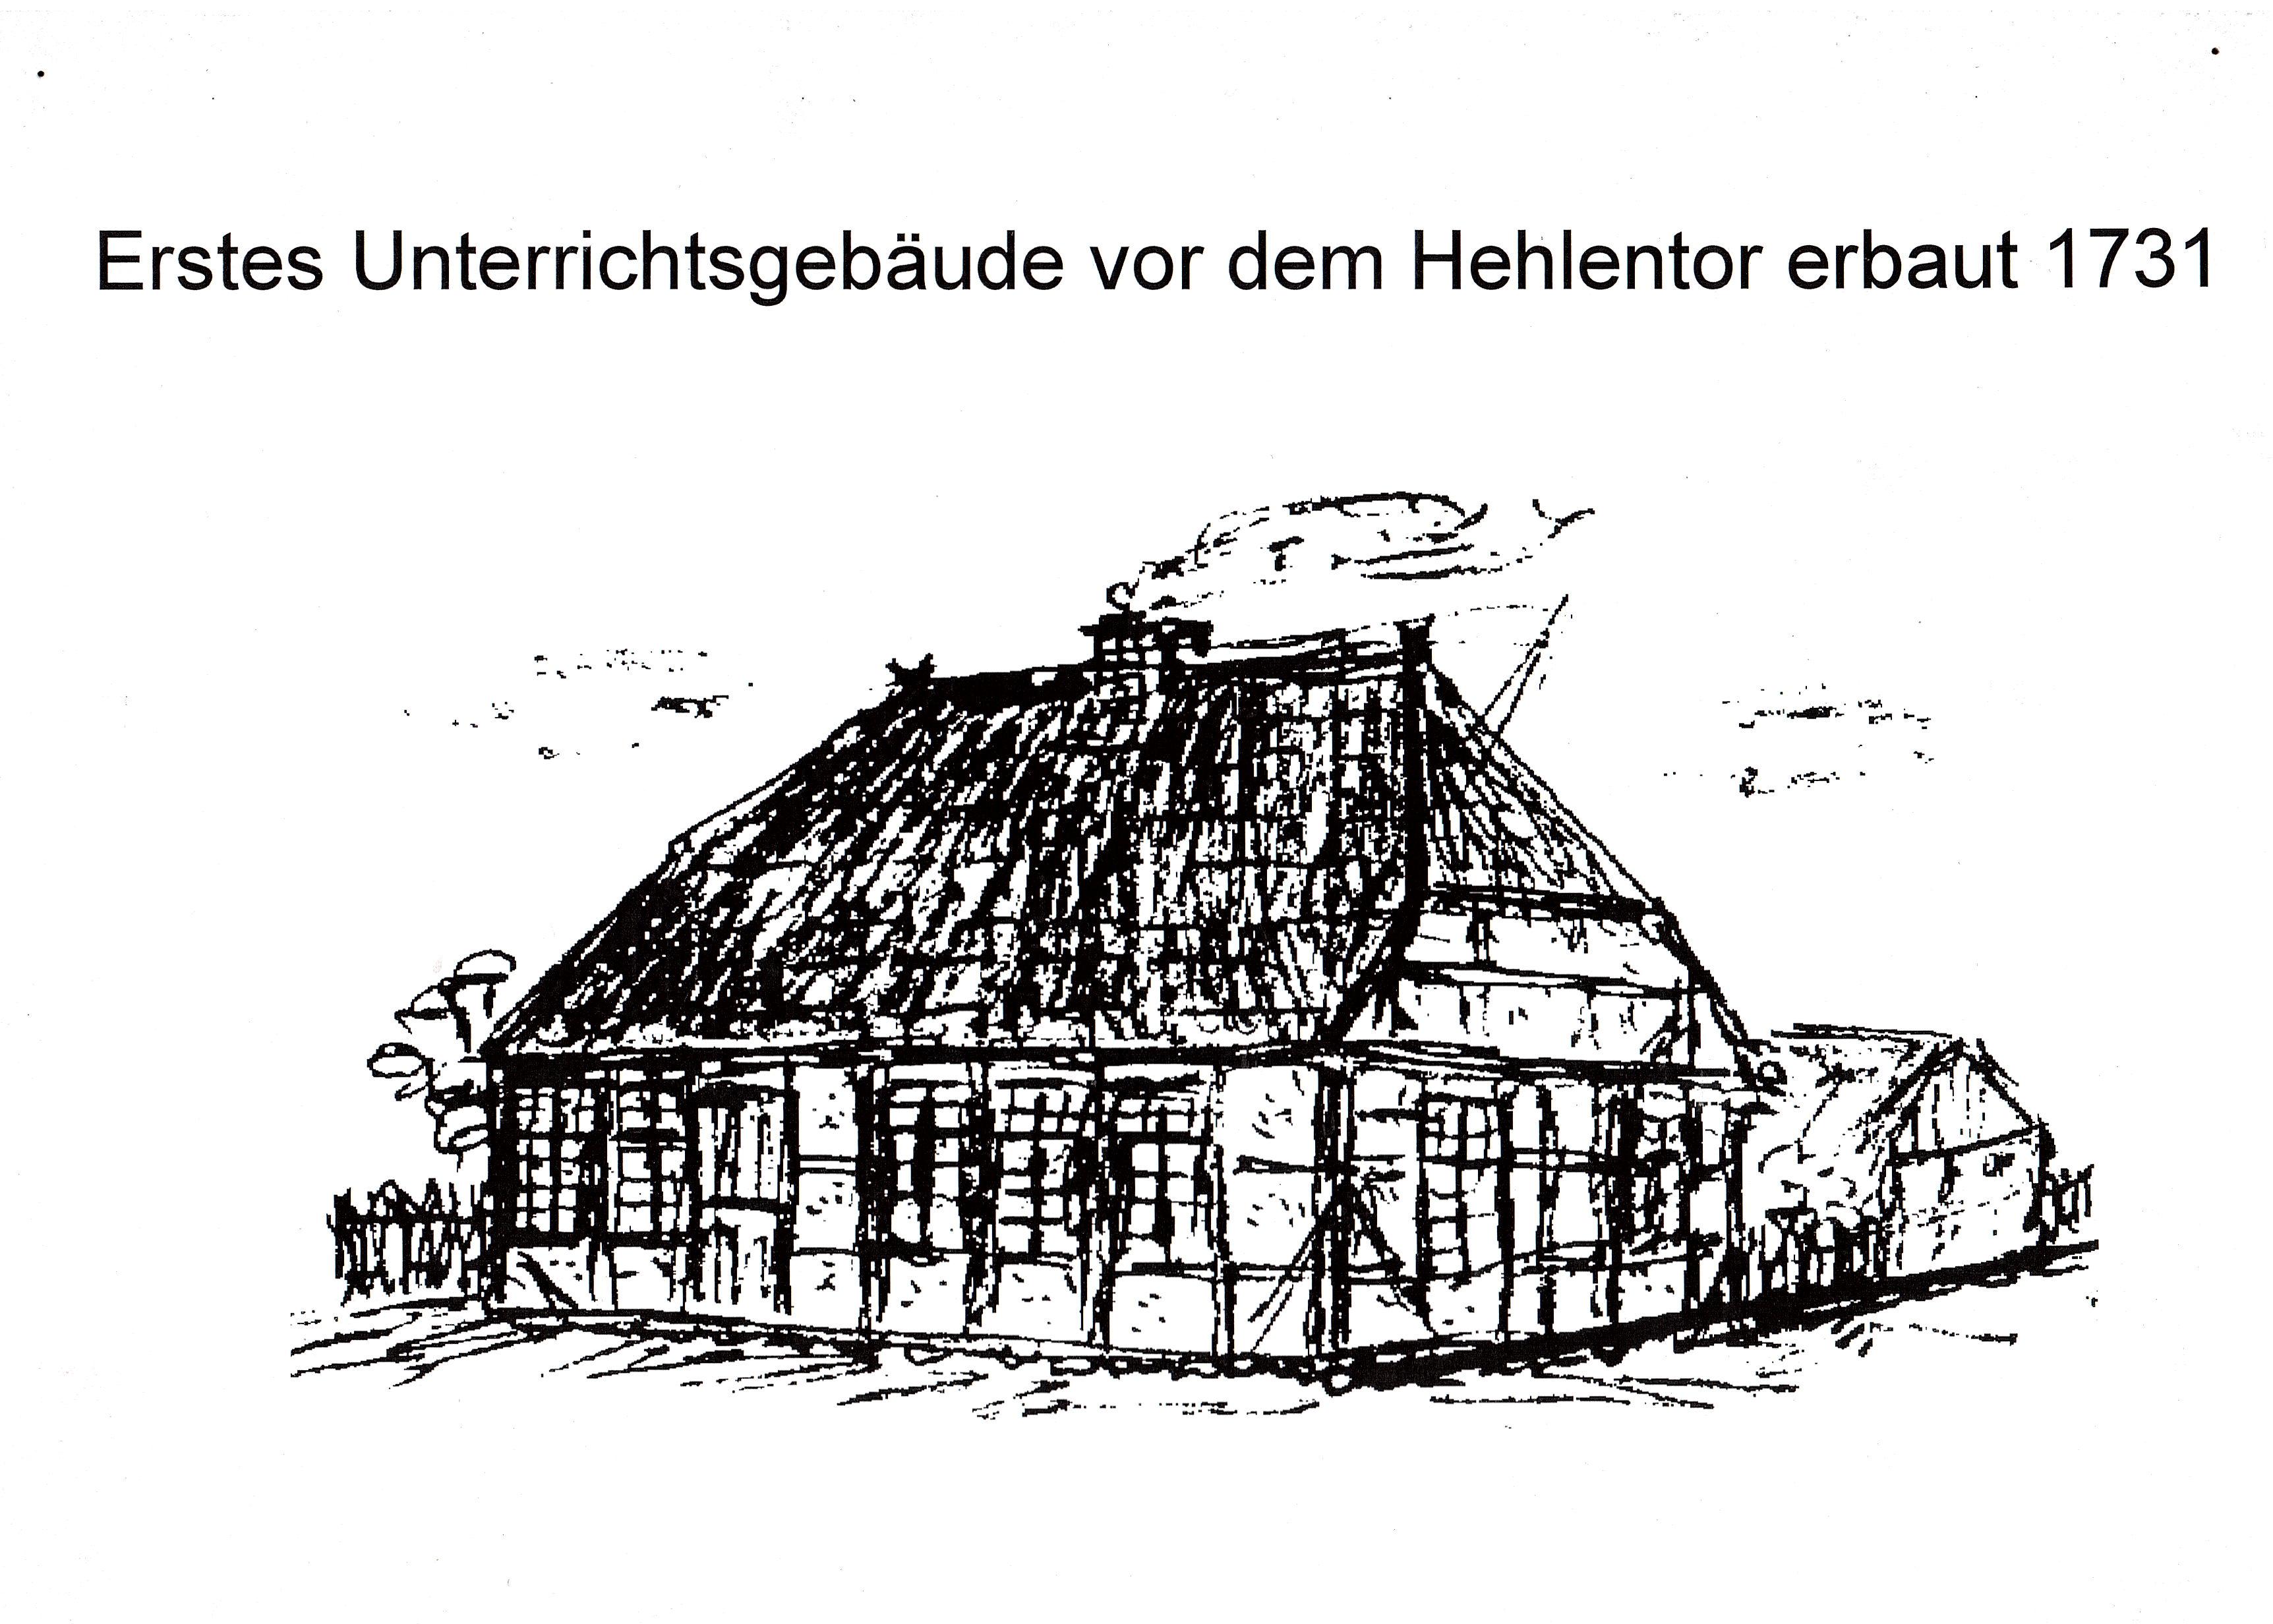 Geschichte – Grundschule Hehlentor Celle